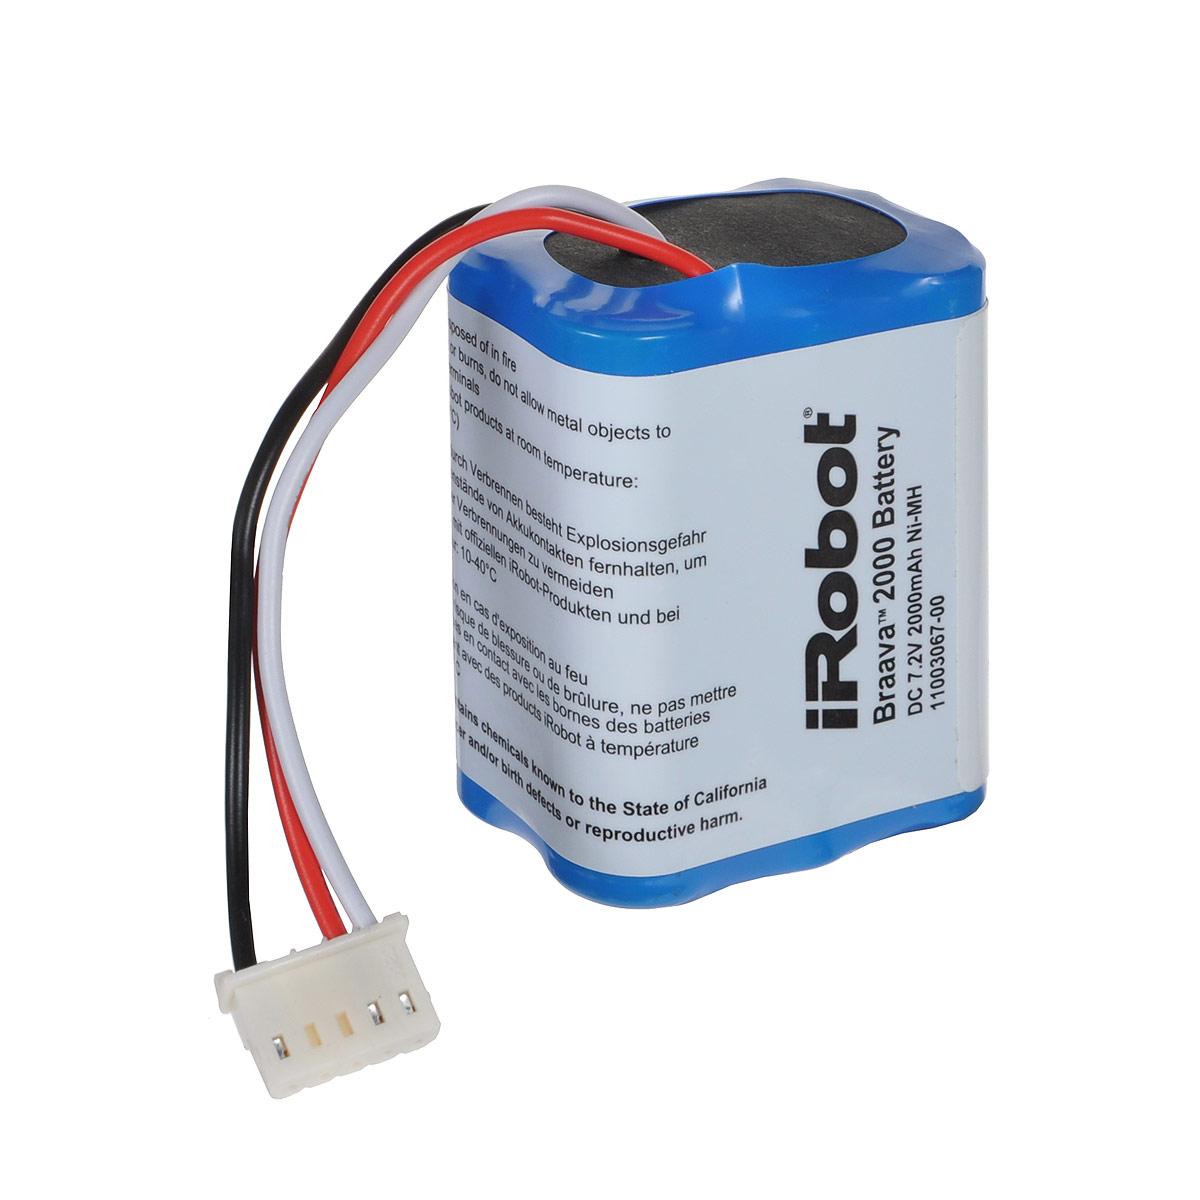 цена на iRobot аккумуляторная батарея NiMH для Braava 380/390t